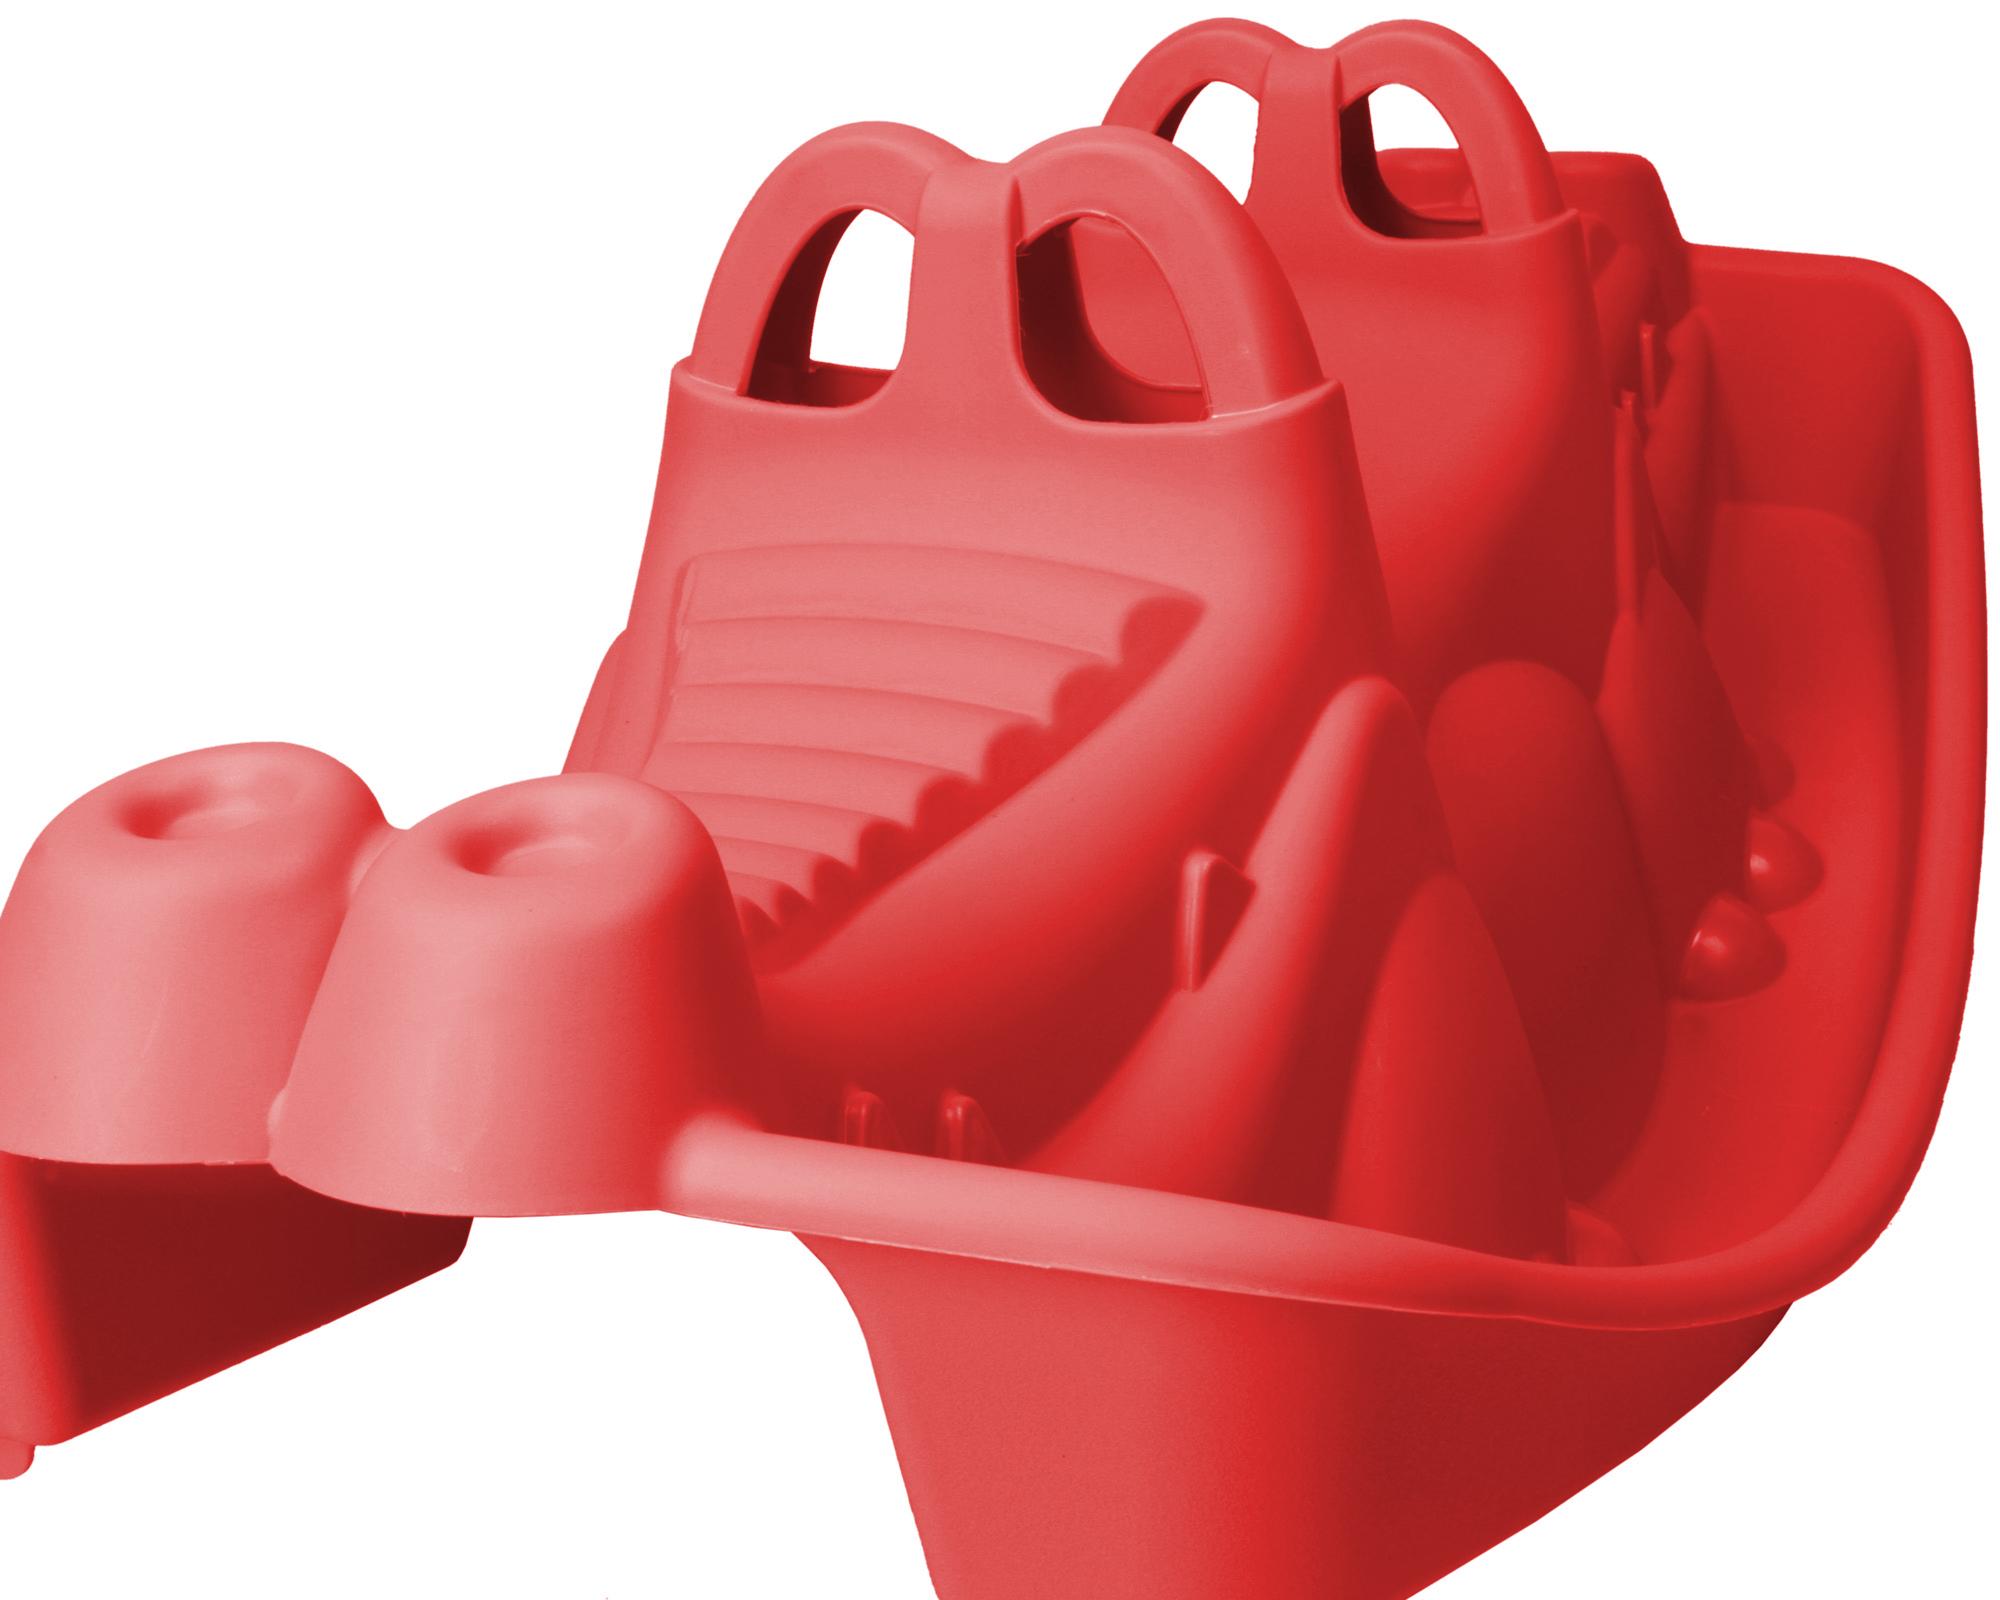 ondis24 kinderwippe babywippe schaukel krokodil rot g nstig online kaufen. Black Bedroom Furniture Sets. Home Design Ideas